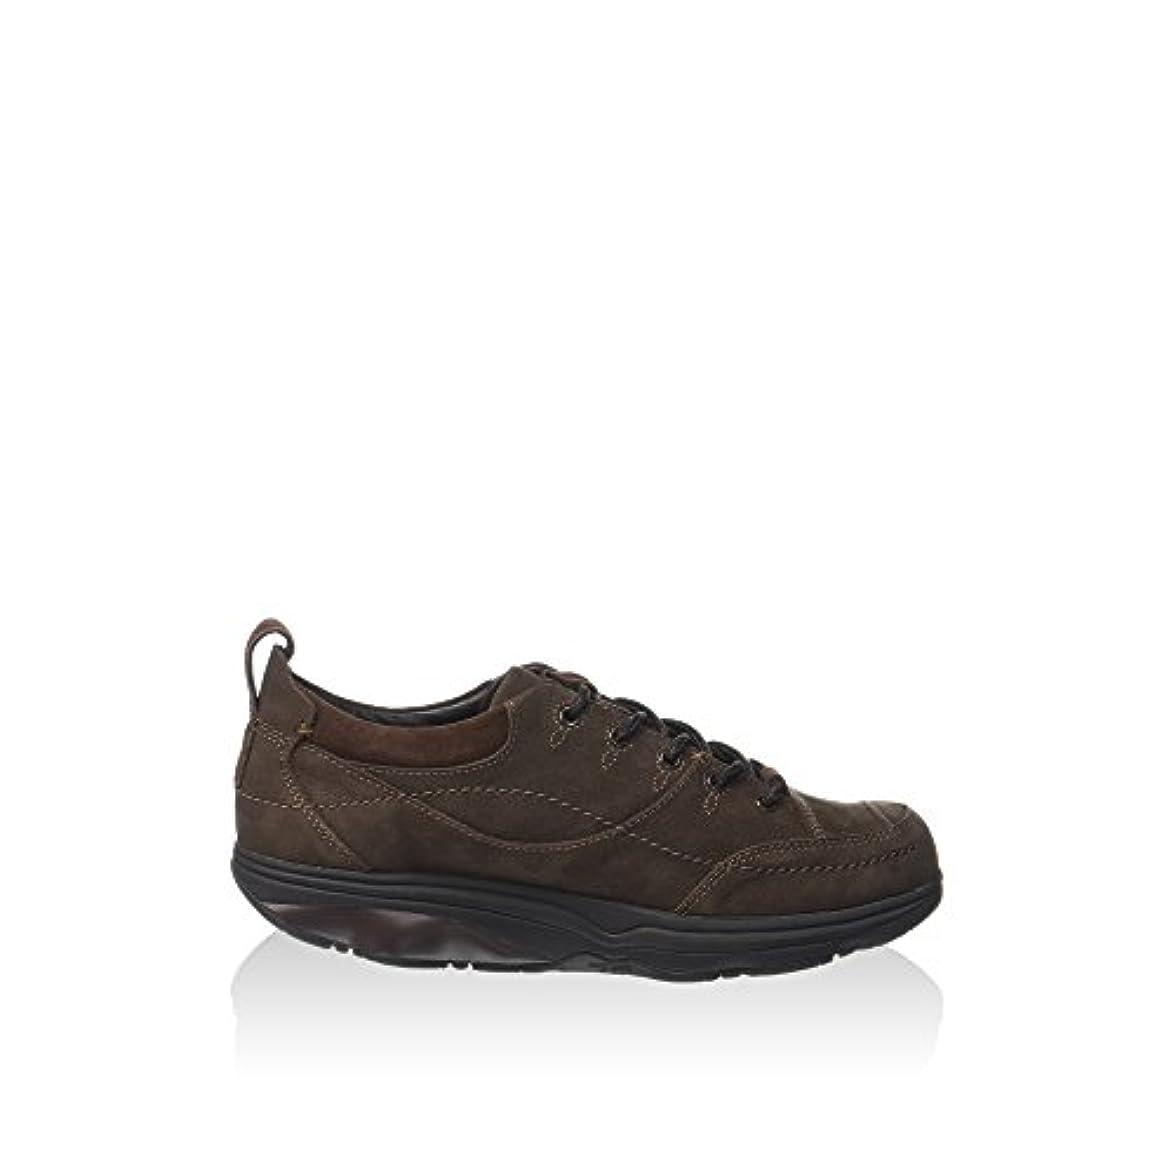 Mbt Pelle Marrone Donna Sneaker